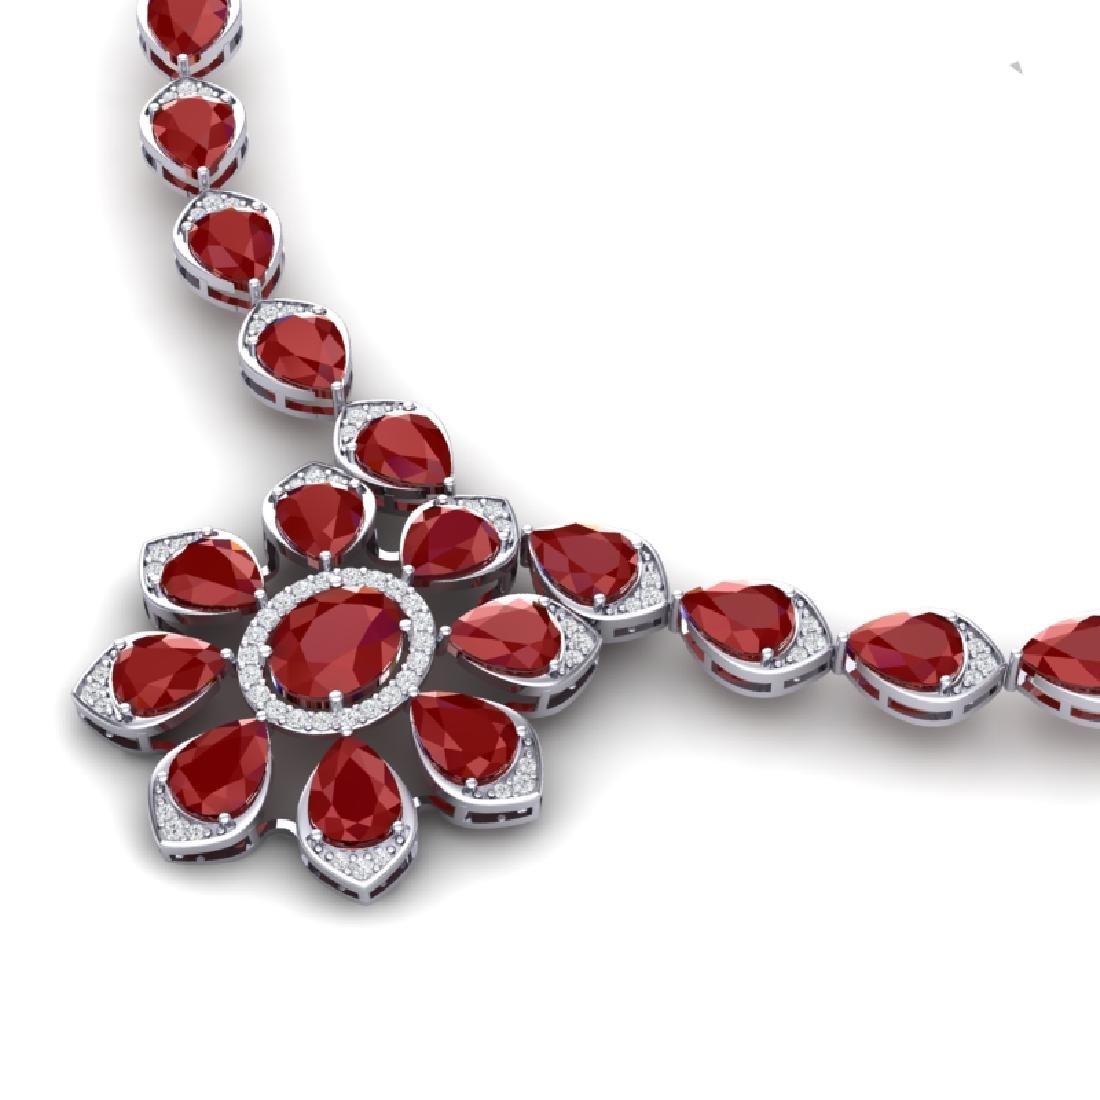 30.70 CTW Royalty Ruby & VS Diamond Necklace 18K White - 2